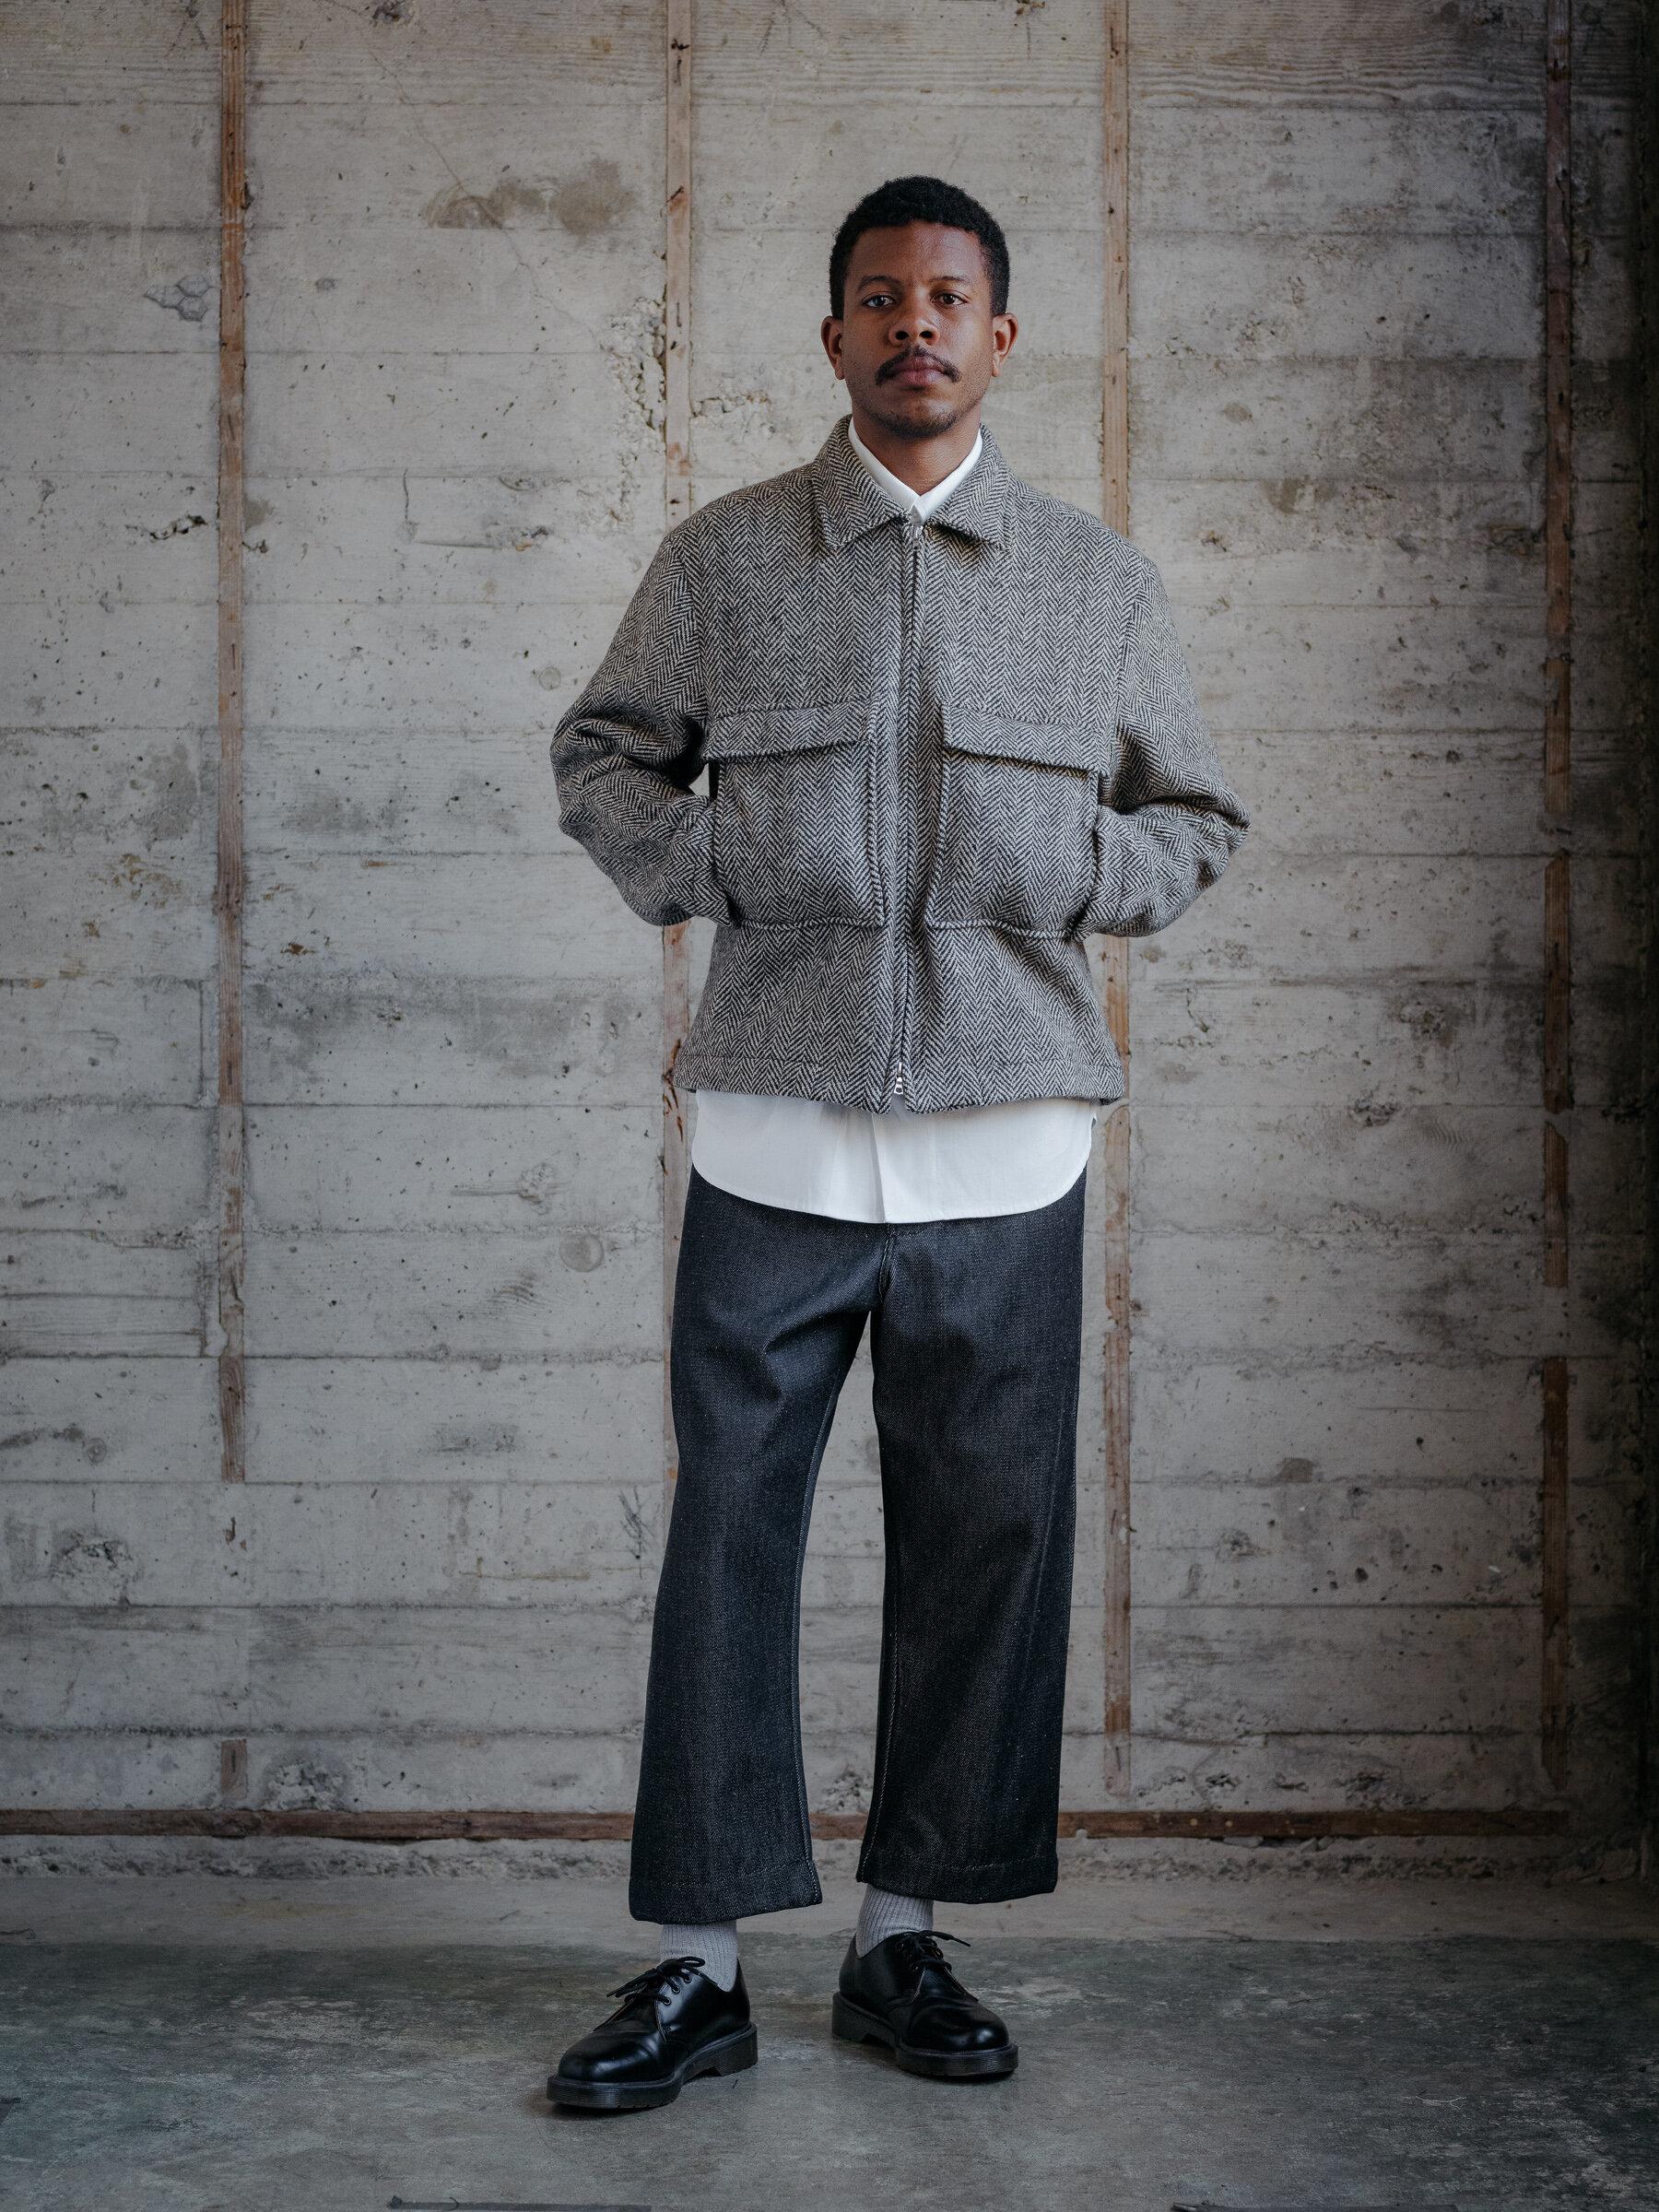 evan-kinori-zip-jacket-lambswool-herringbone-woven-in-ireland-made-in-california-6